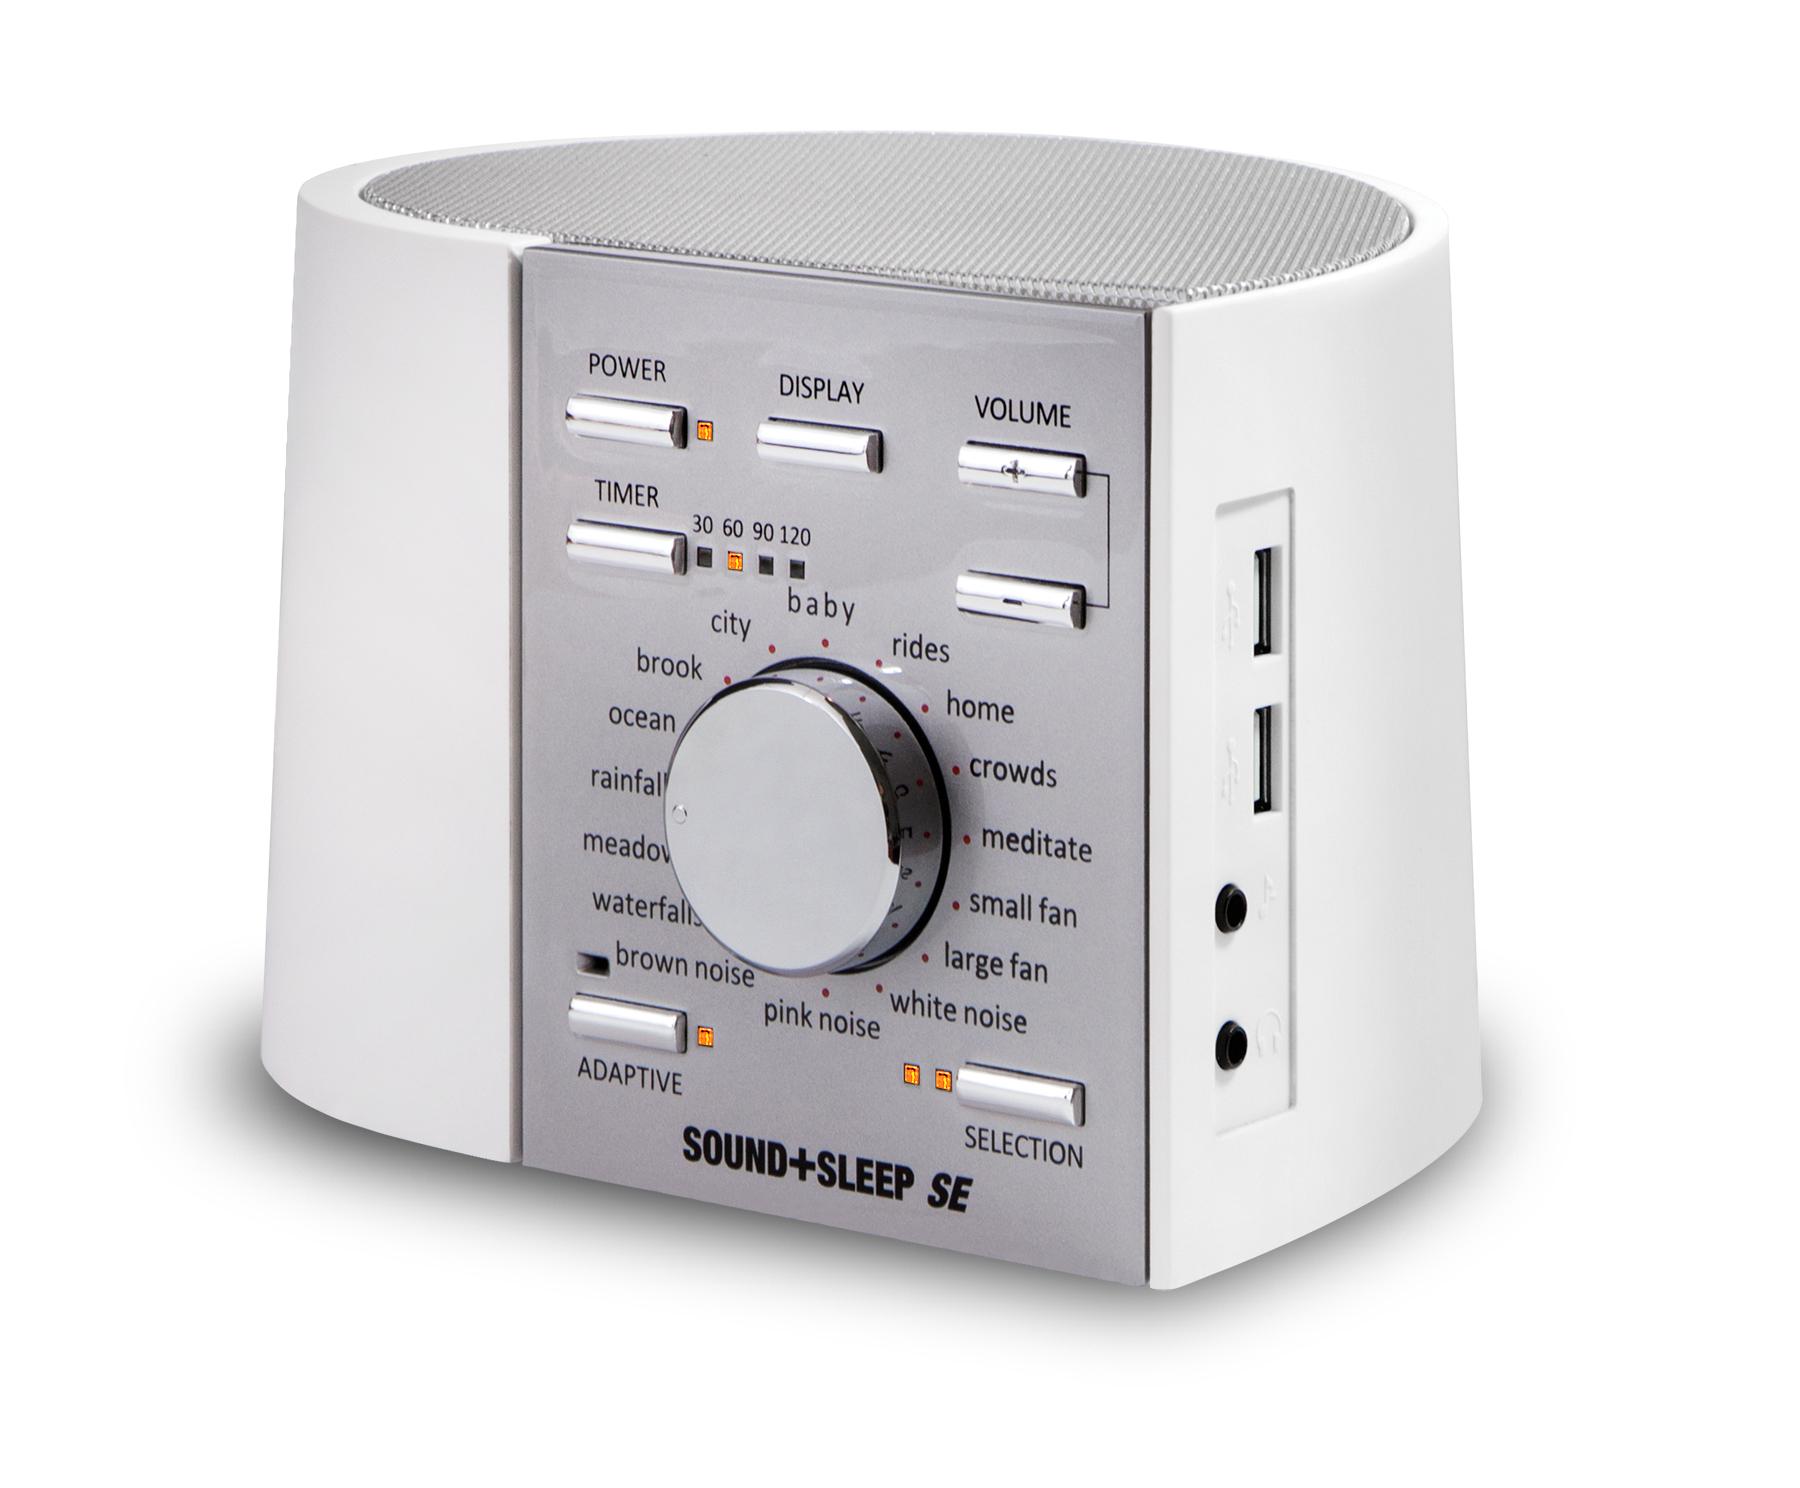 SOUND + SLEEP ASM1005 SOUND SLEEP THERAPY SYSTEM